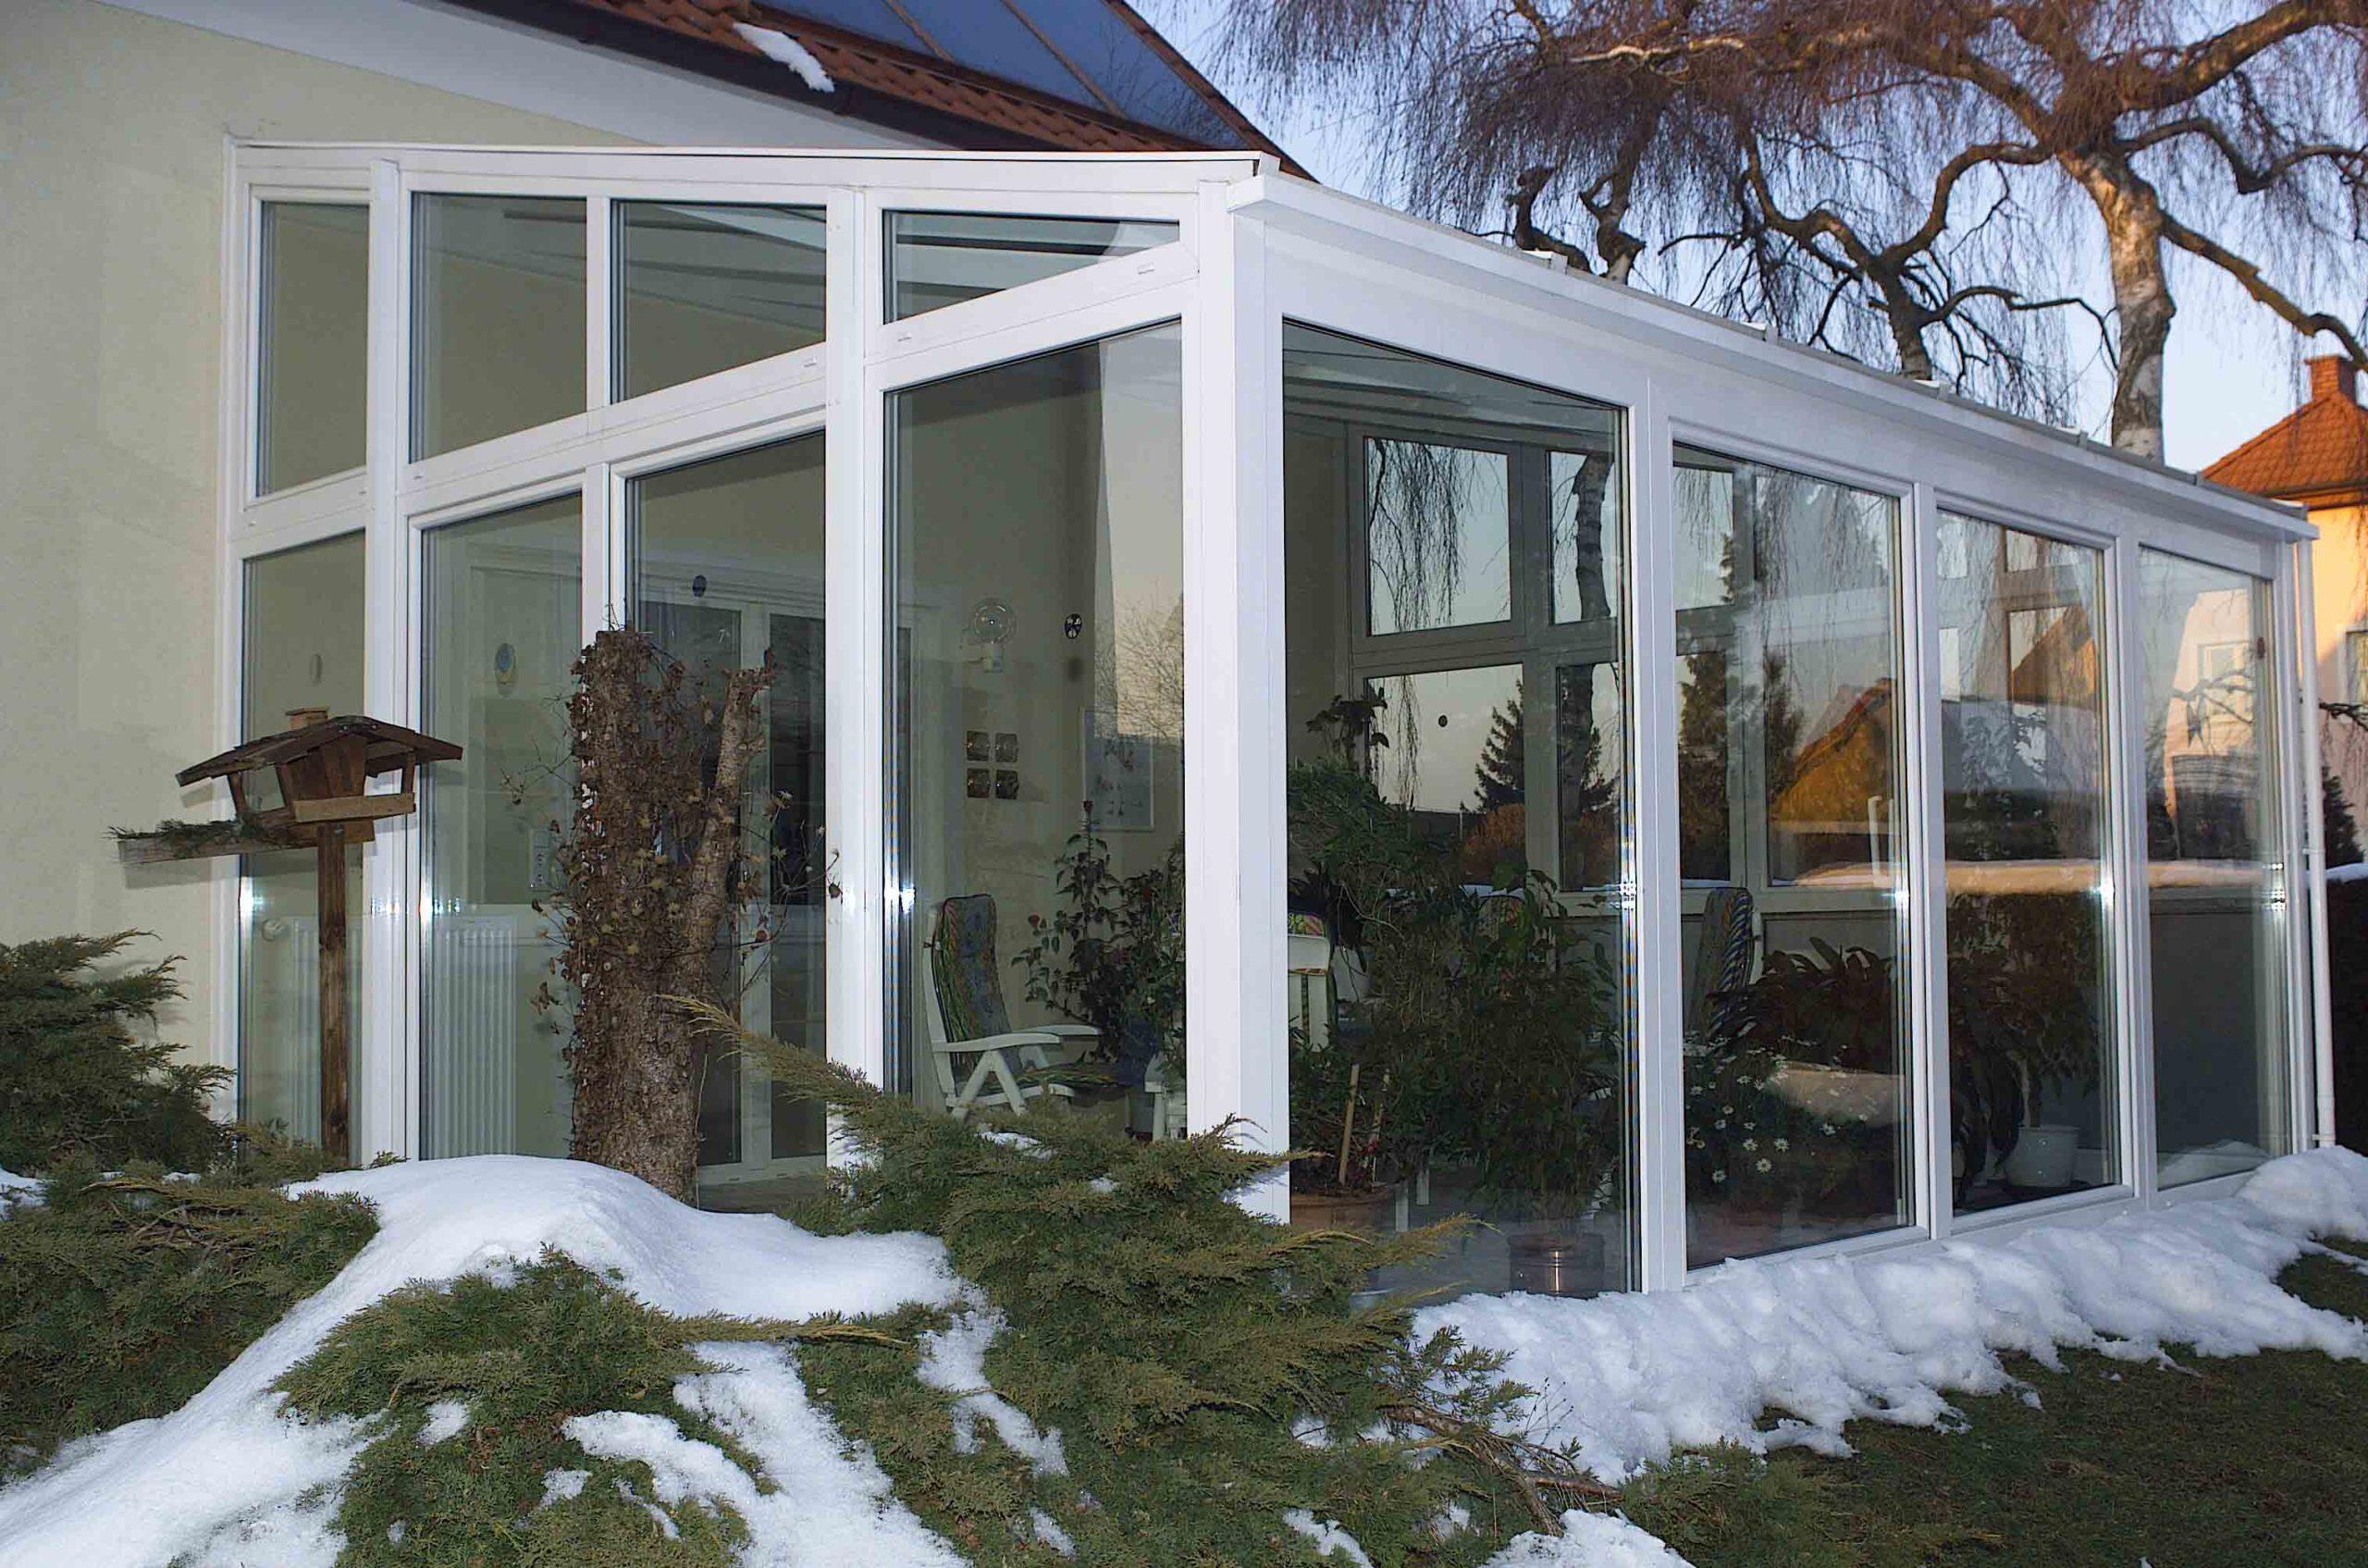 wintergarten oberneukirchen referenzen wintergarten schmidinger. Black Bedroom Furniture Sets. Home Design Ideas